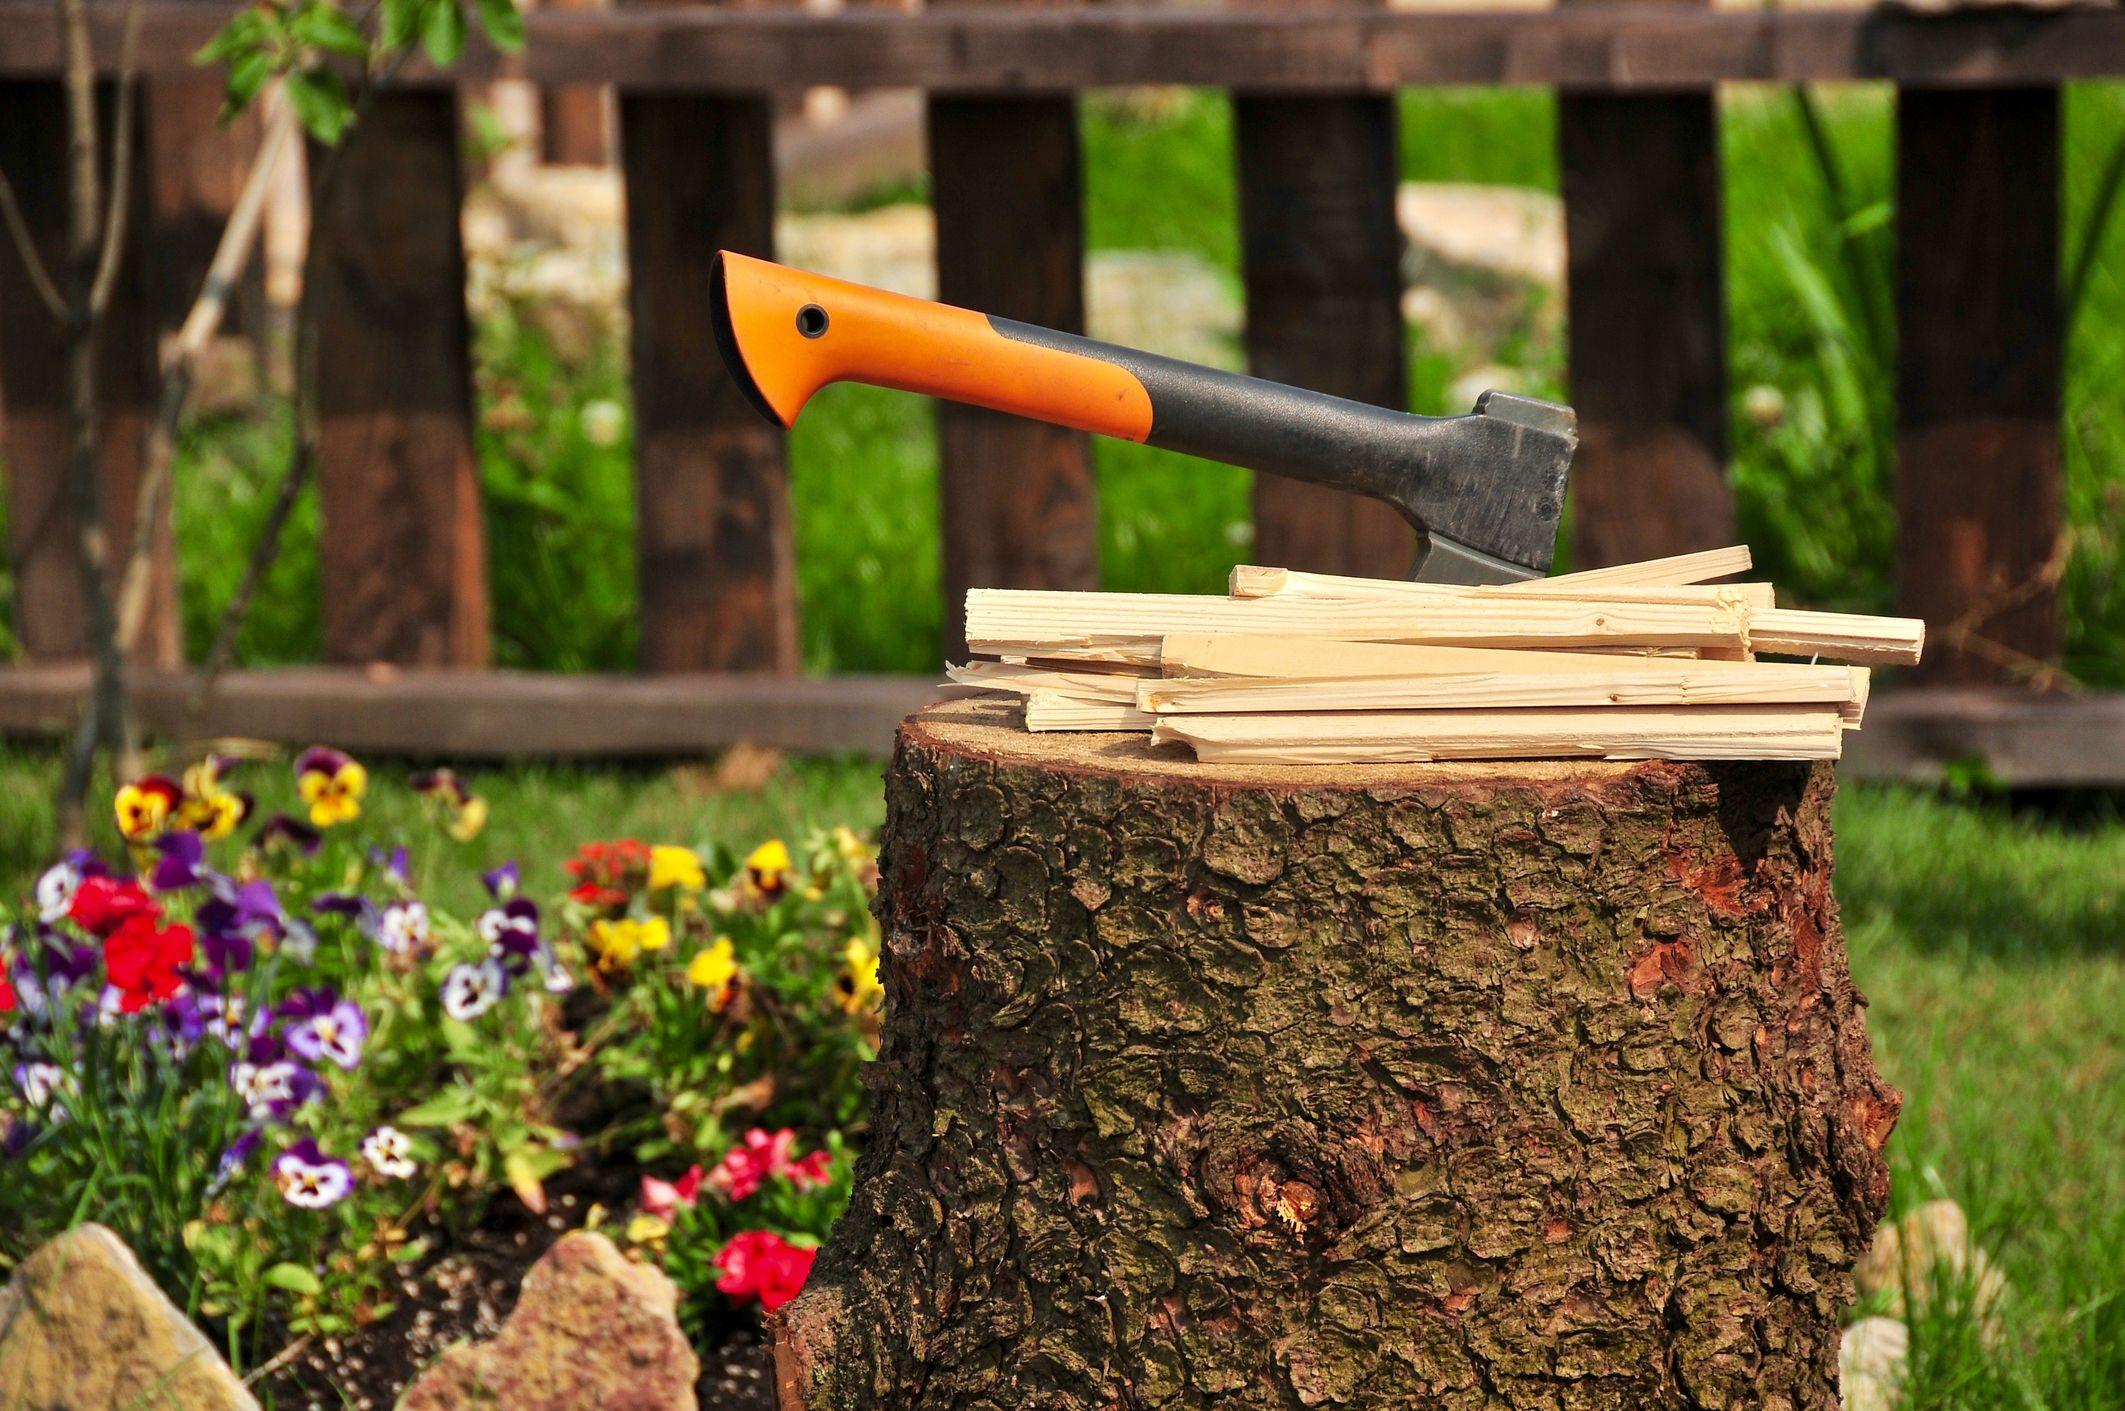 How to turn tree stump into art tree stump removal reviewsmspy